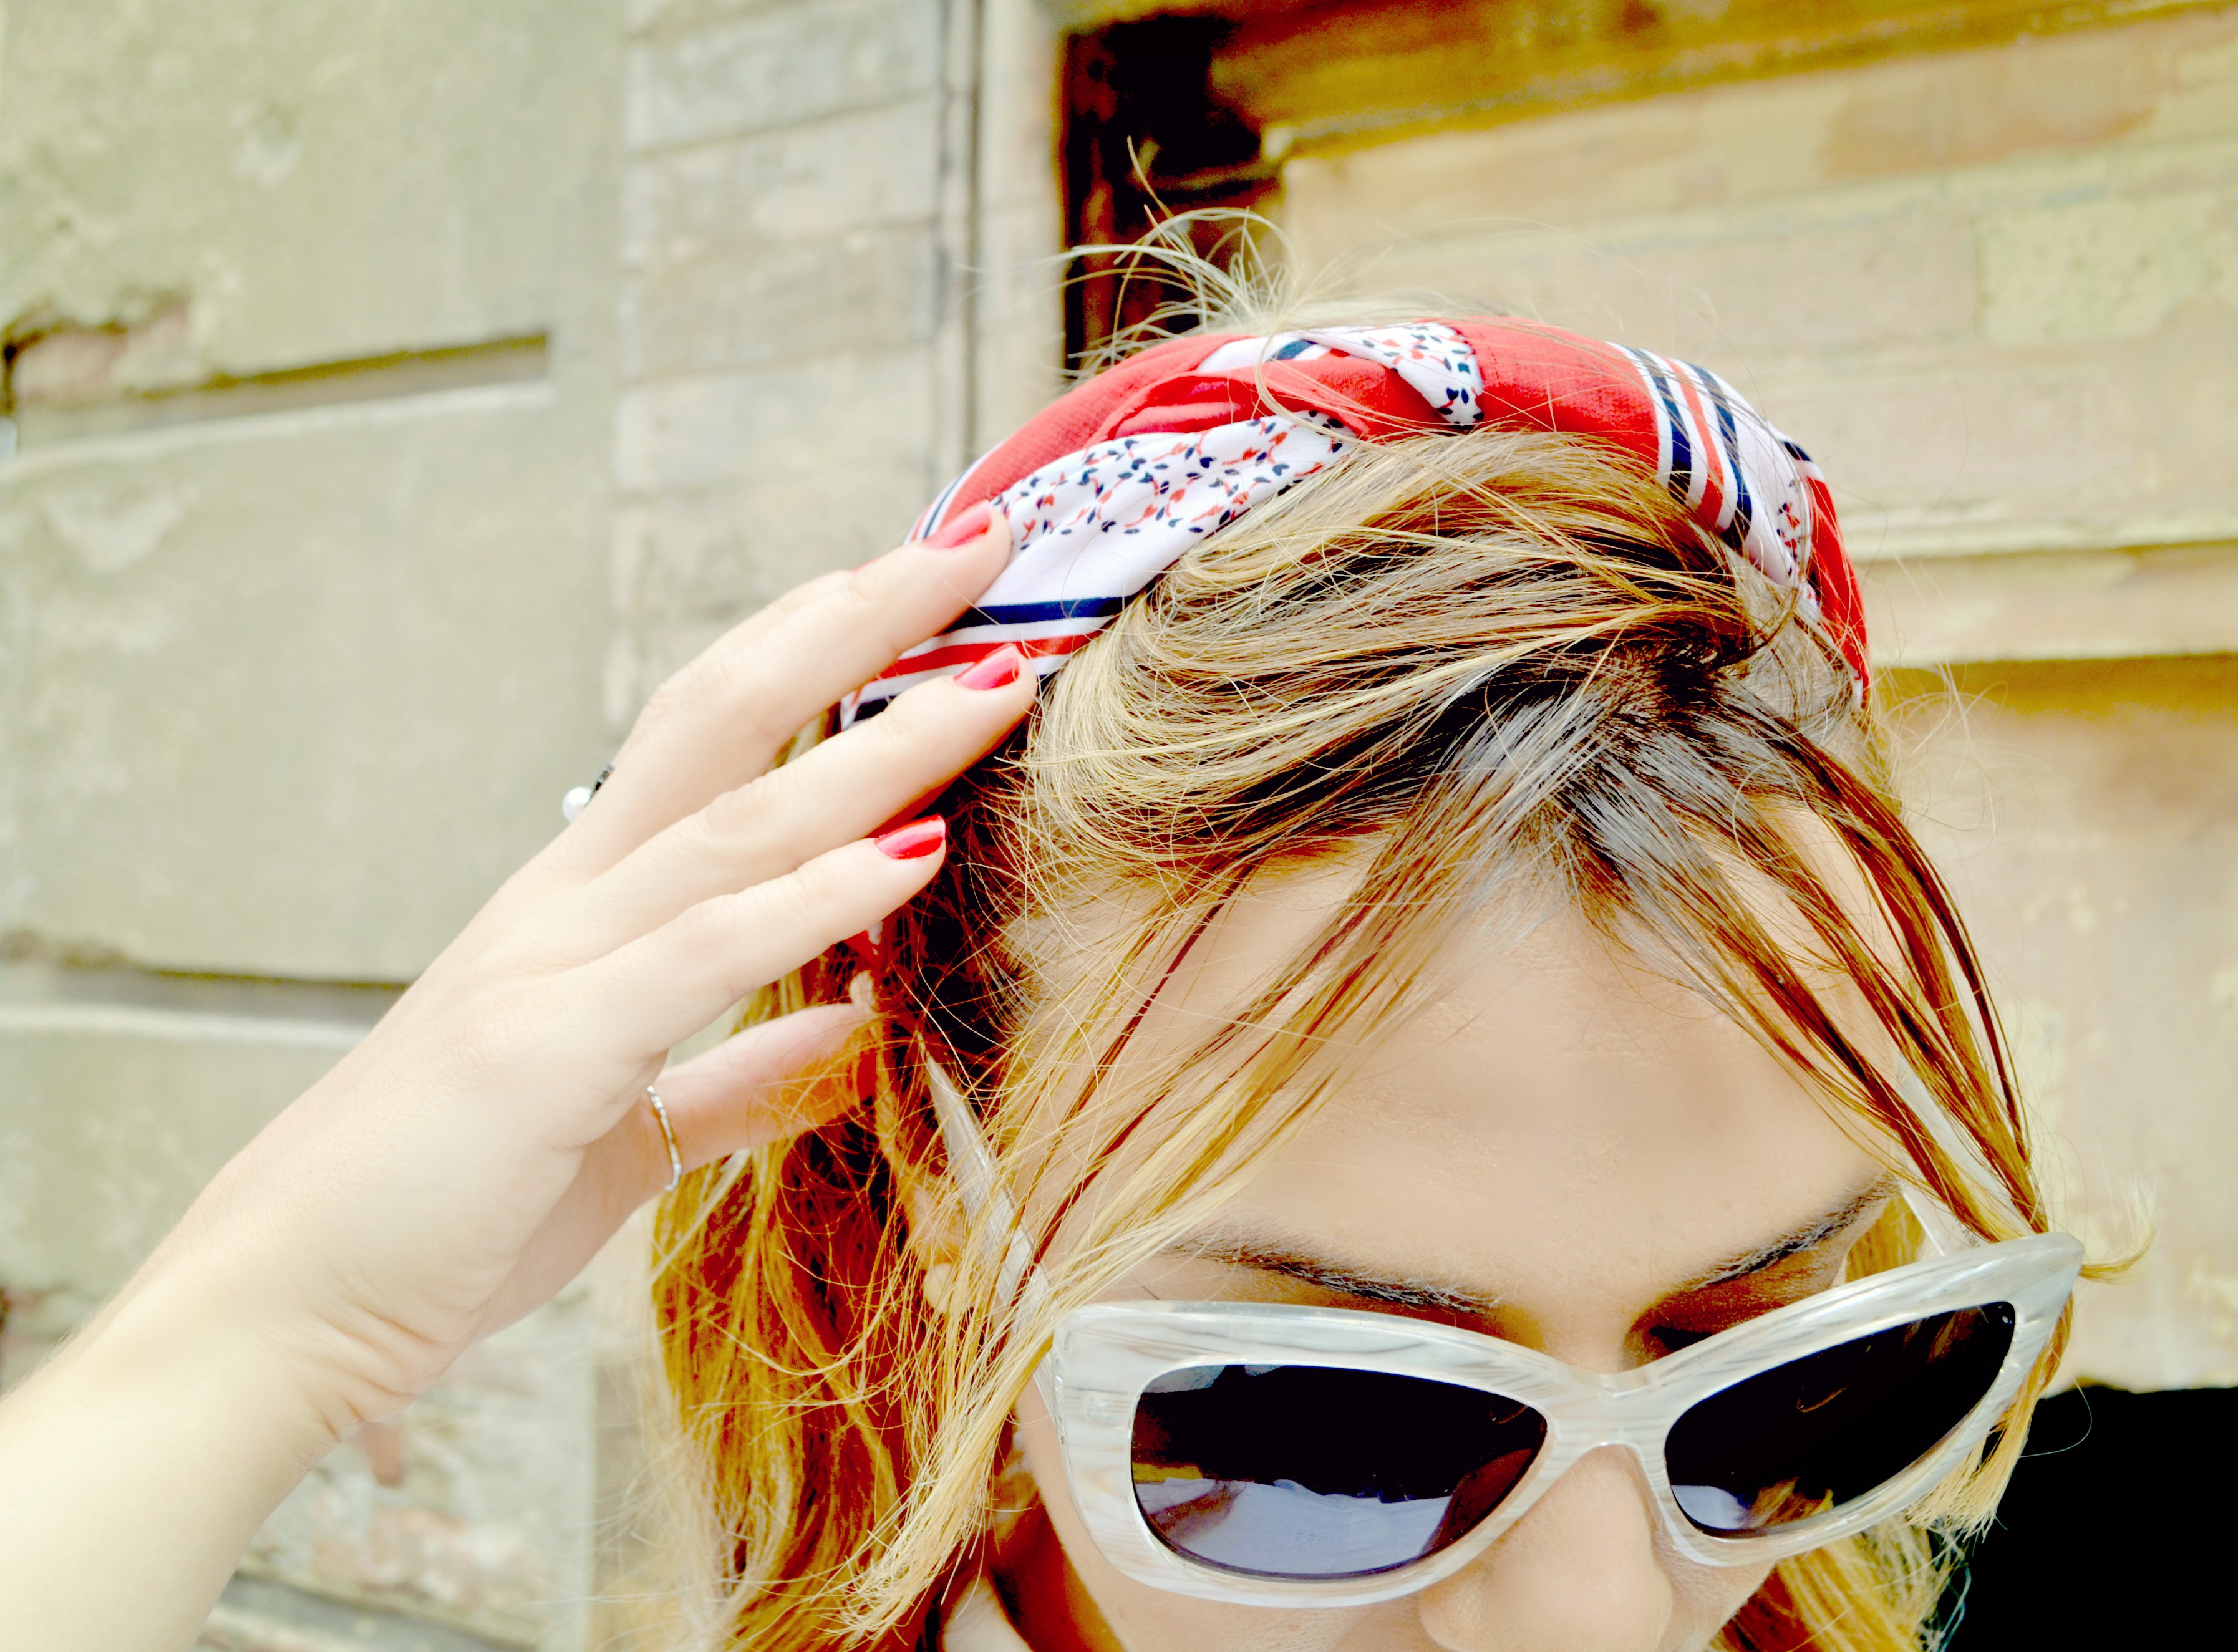 ChicAdicta-blog-de-moda-como-usar-panuelos-Chic-Adicta-influencer-pinup-style-gafas-blancas-fashion-traveller-PiensaenChic-Piensa-en-Chic